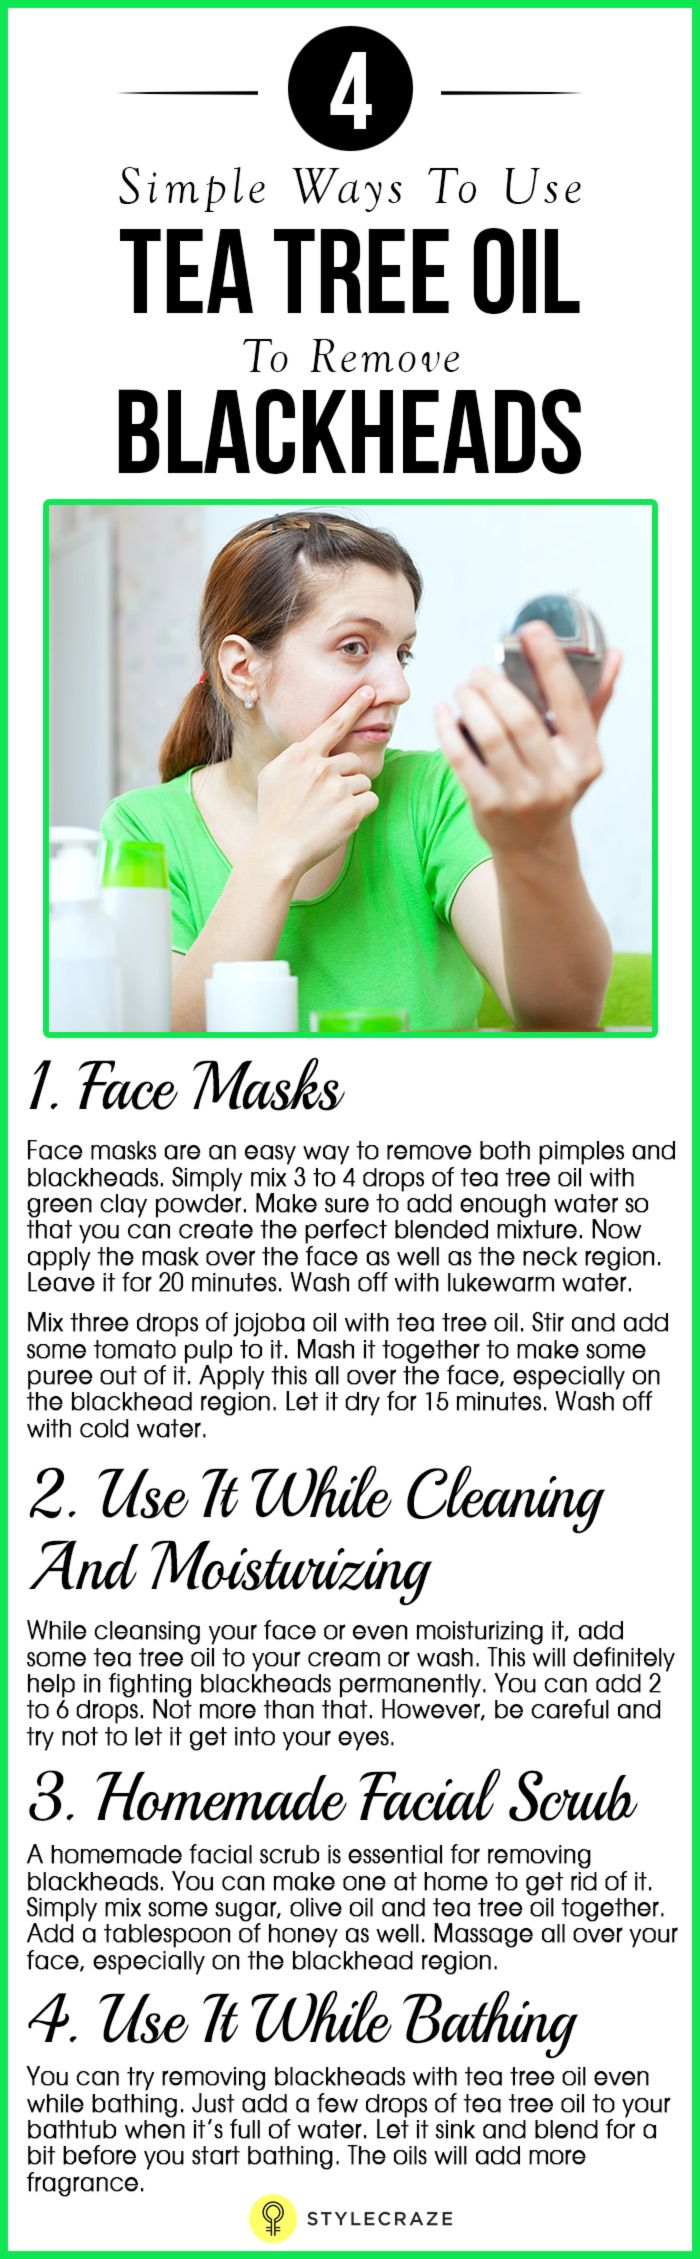 6 Simple Ways To Use Tea Tree Oil To Remove Blackheads